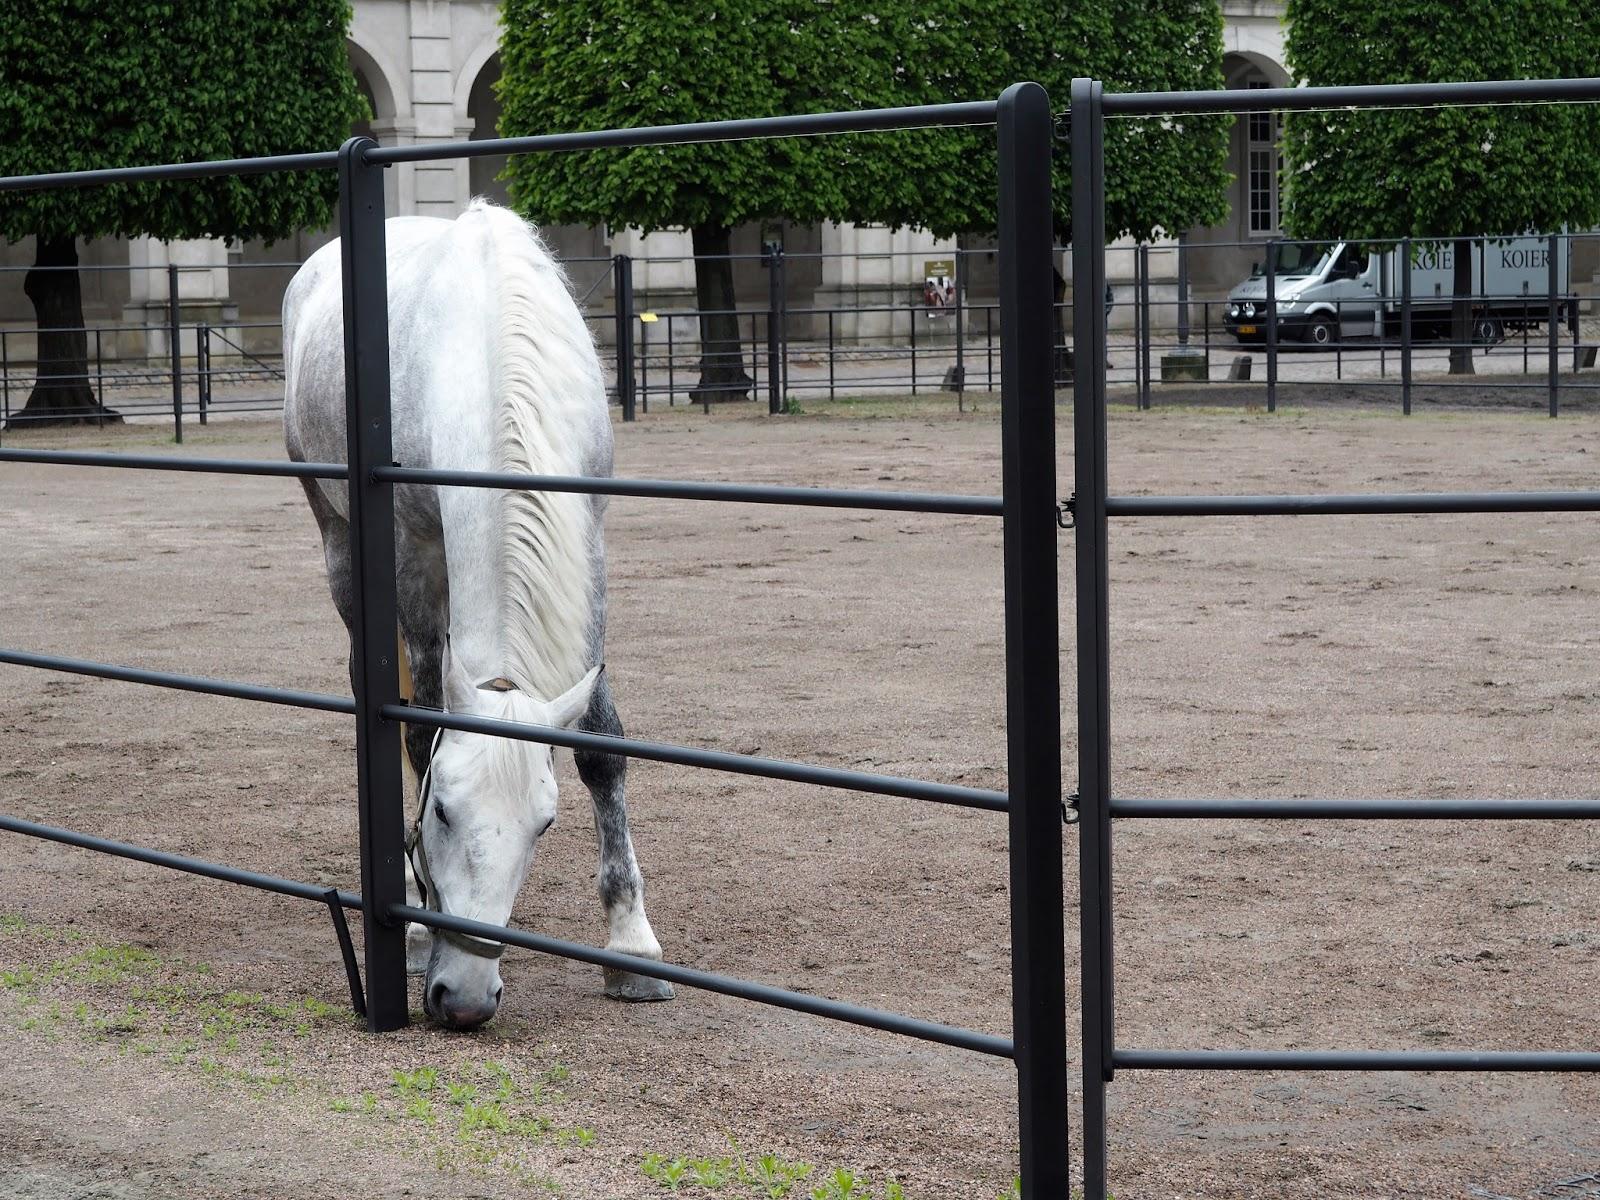 A white horse at Christiansborg Palace, Copenhagen